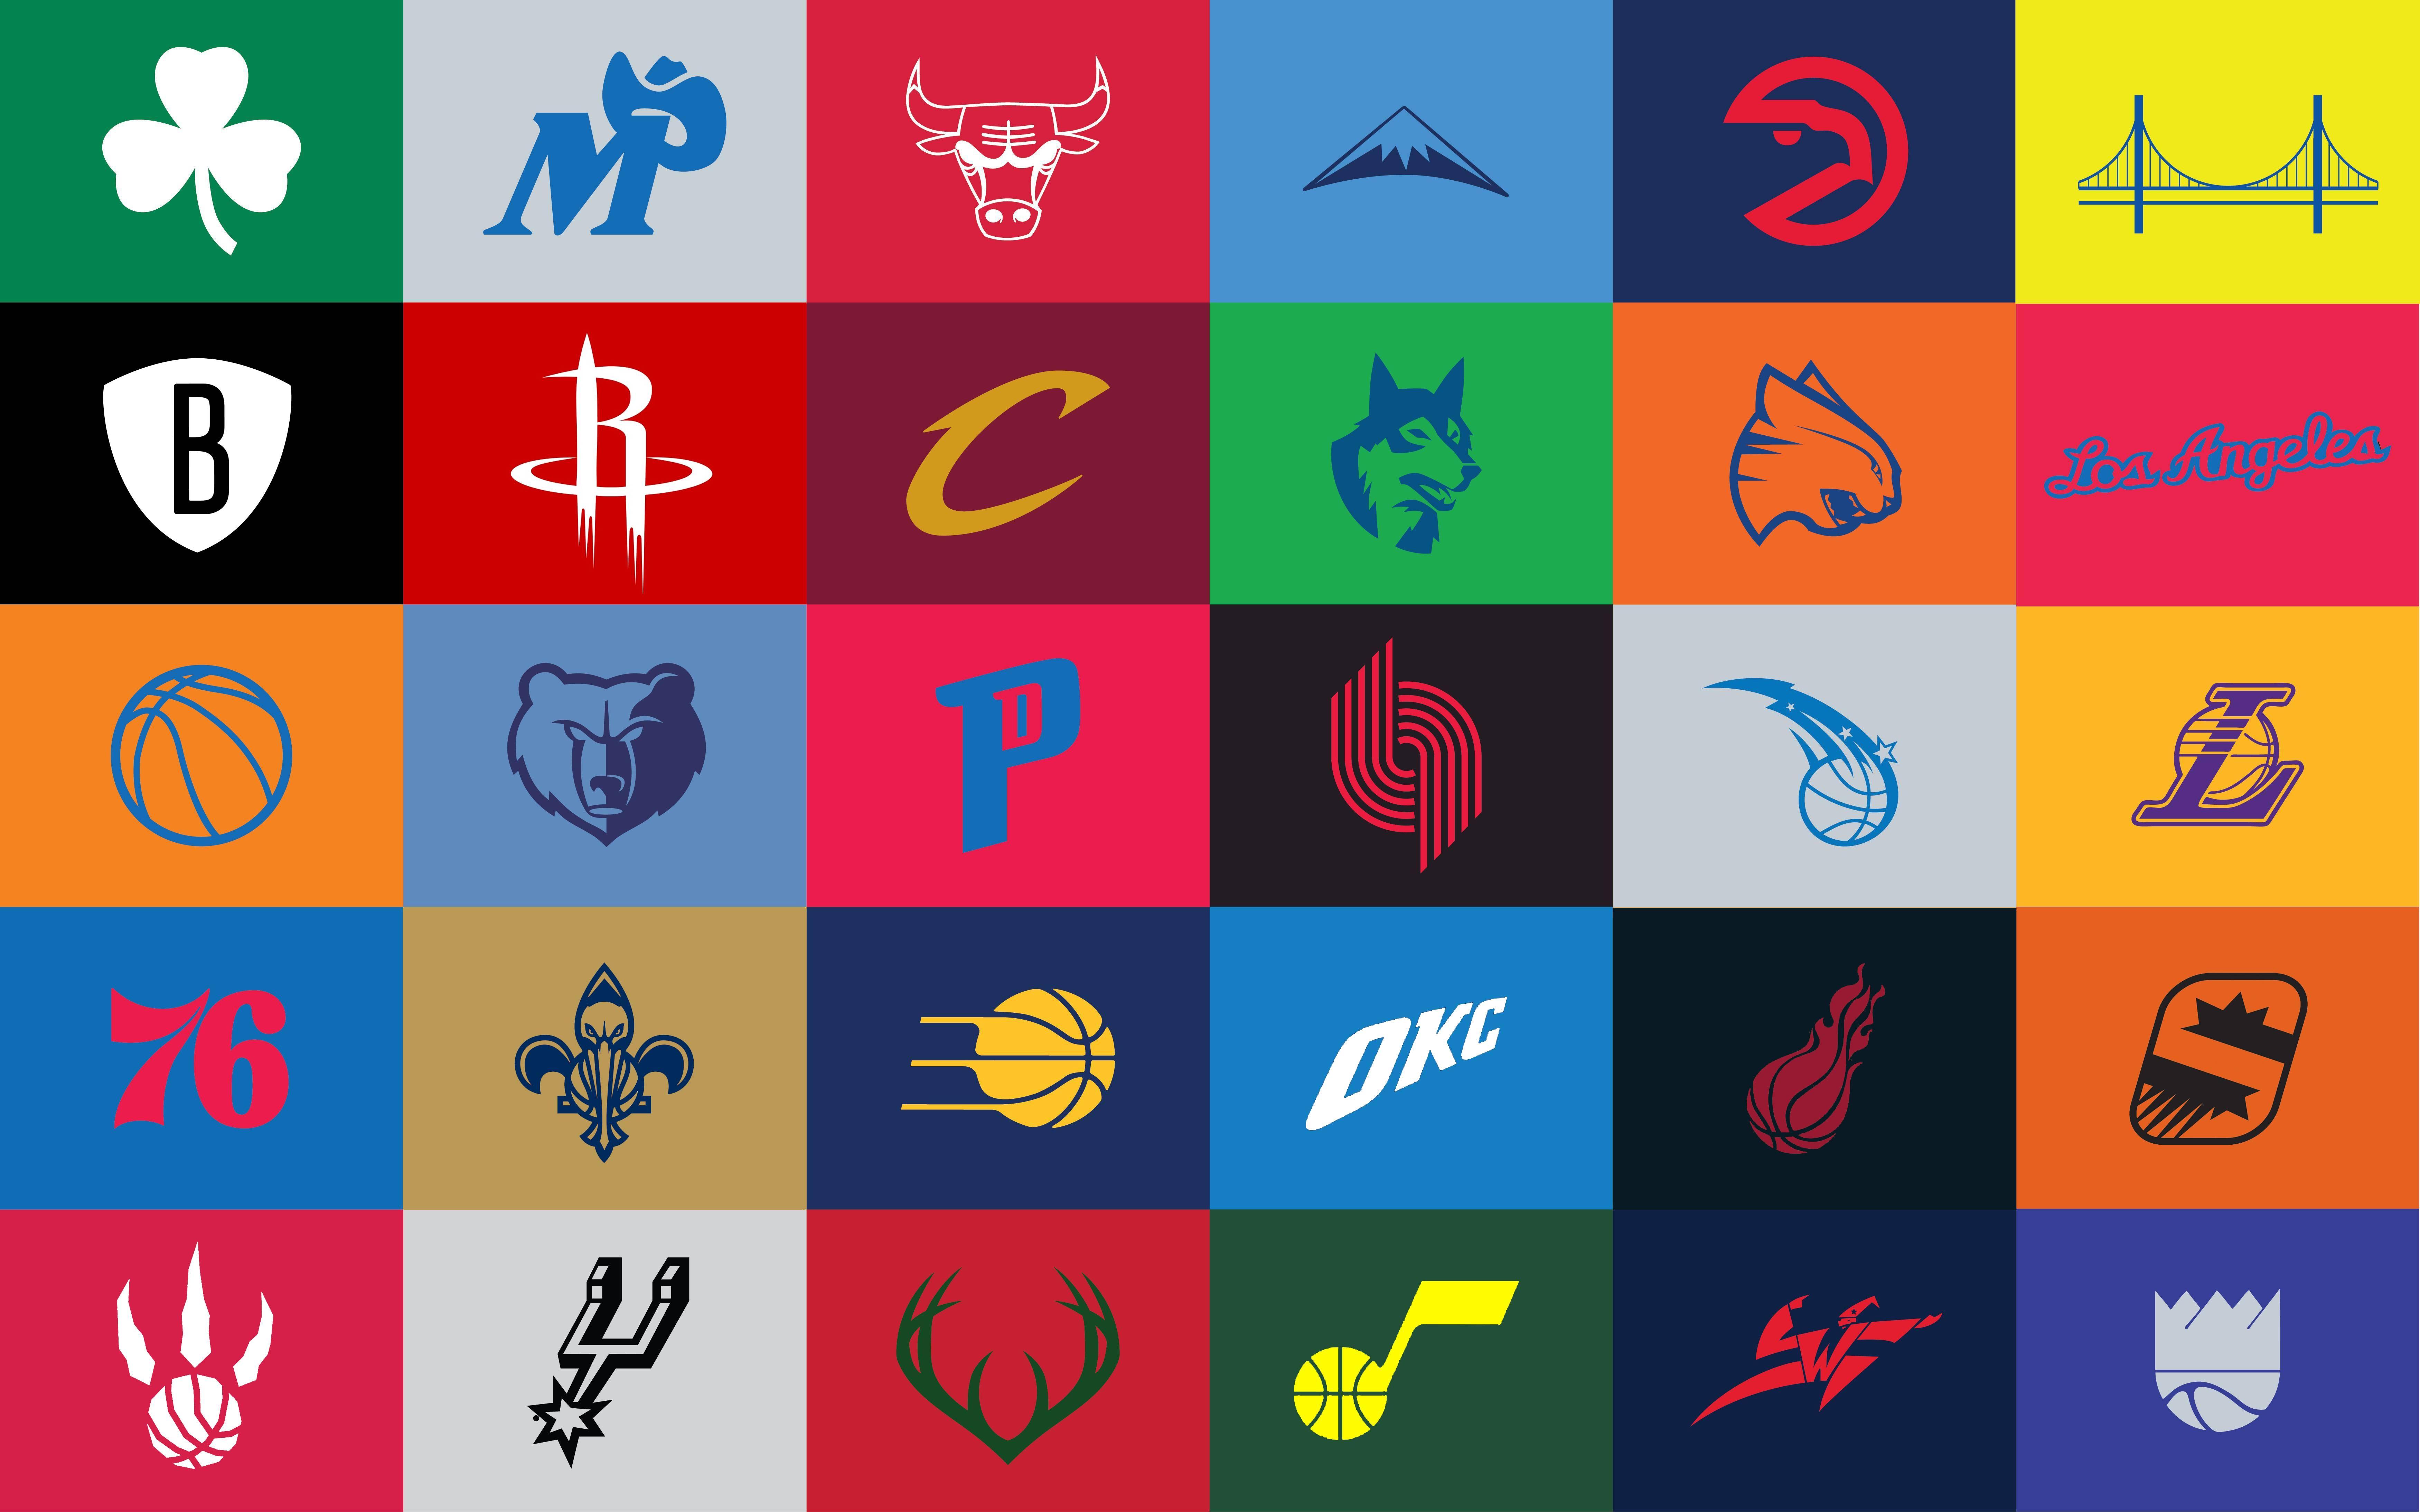 I Made A Few Adjustments To The Minimalist Nba Logos - Nba Team Logos Minimalist , HD Wallpaper & Backgrounds